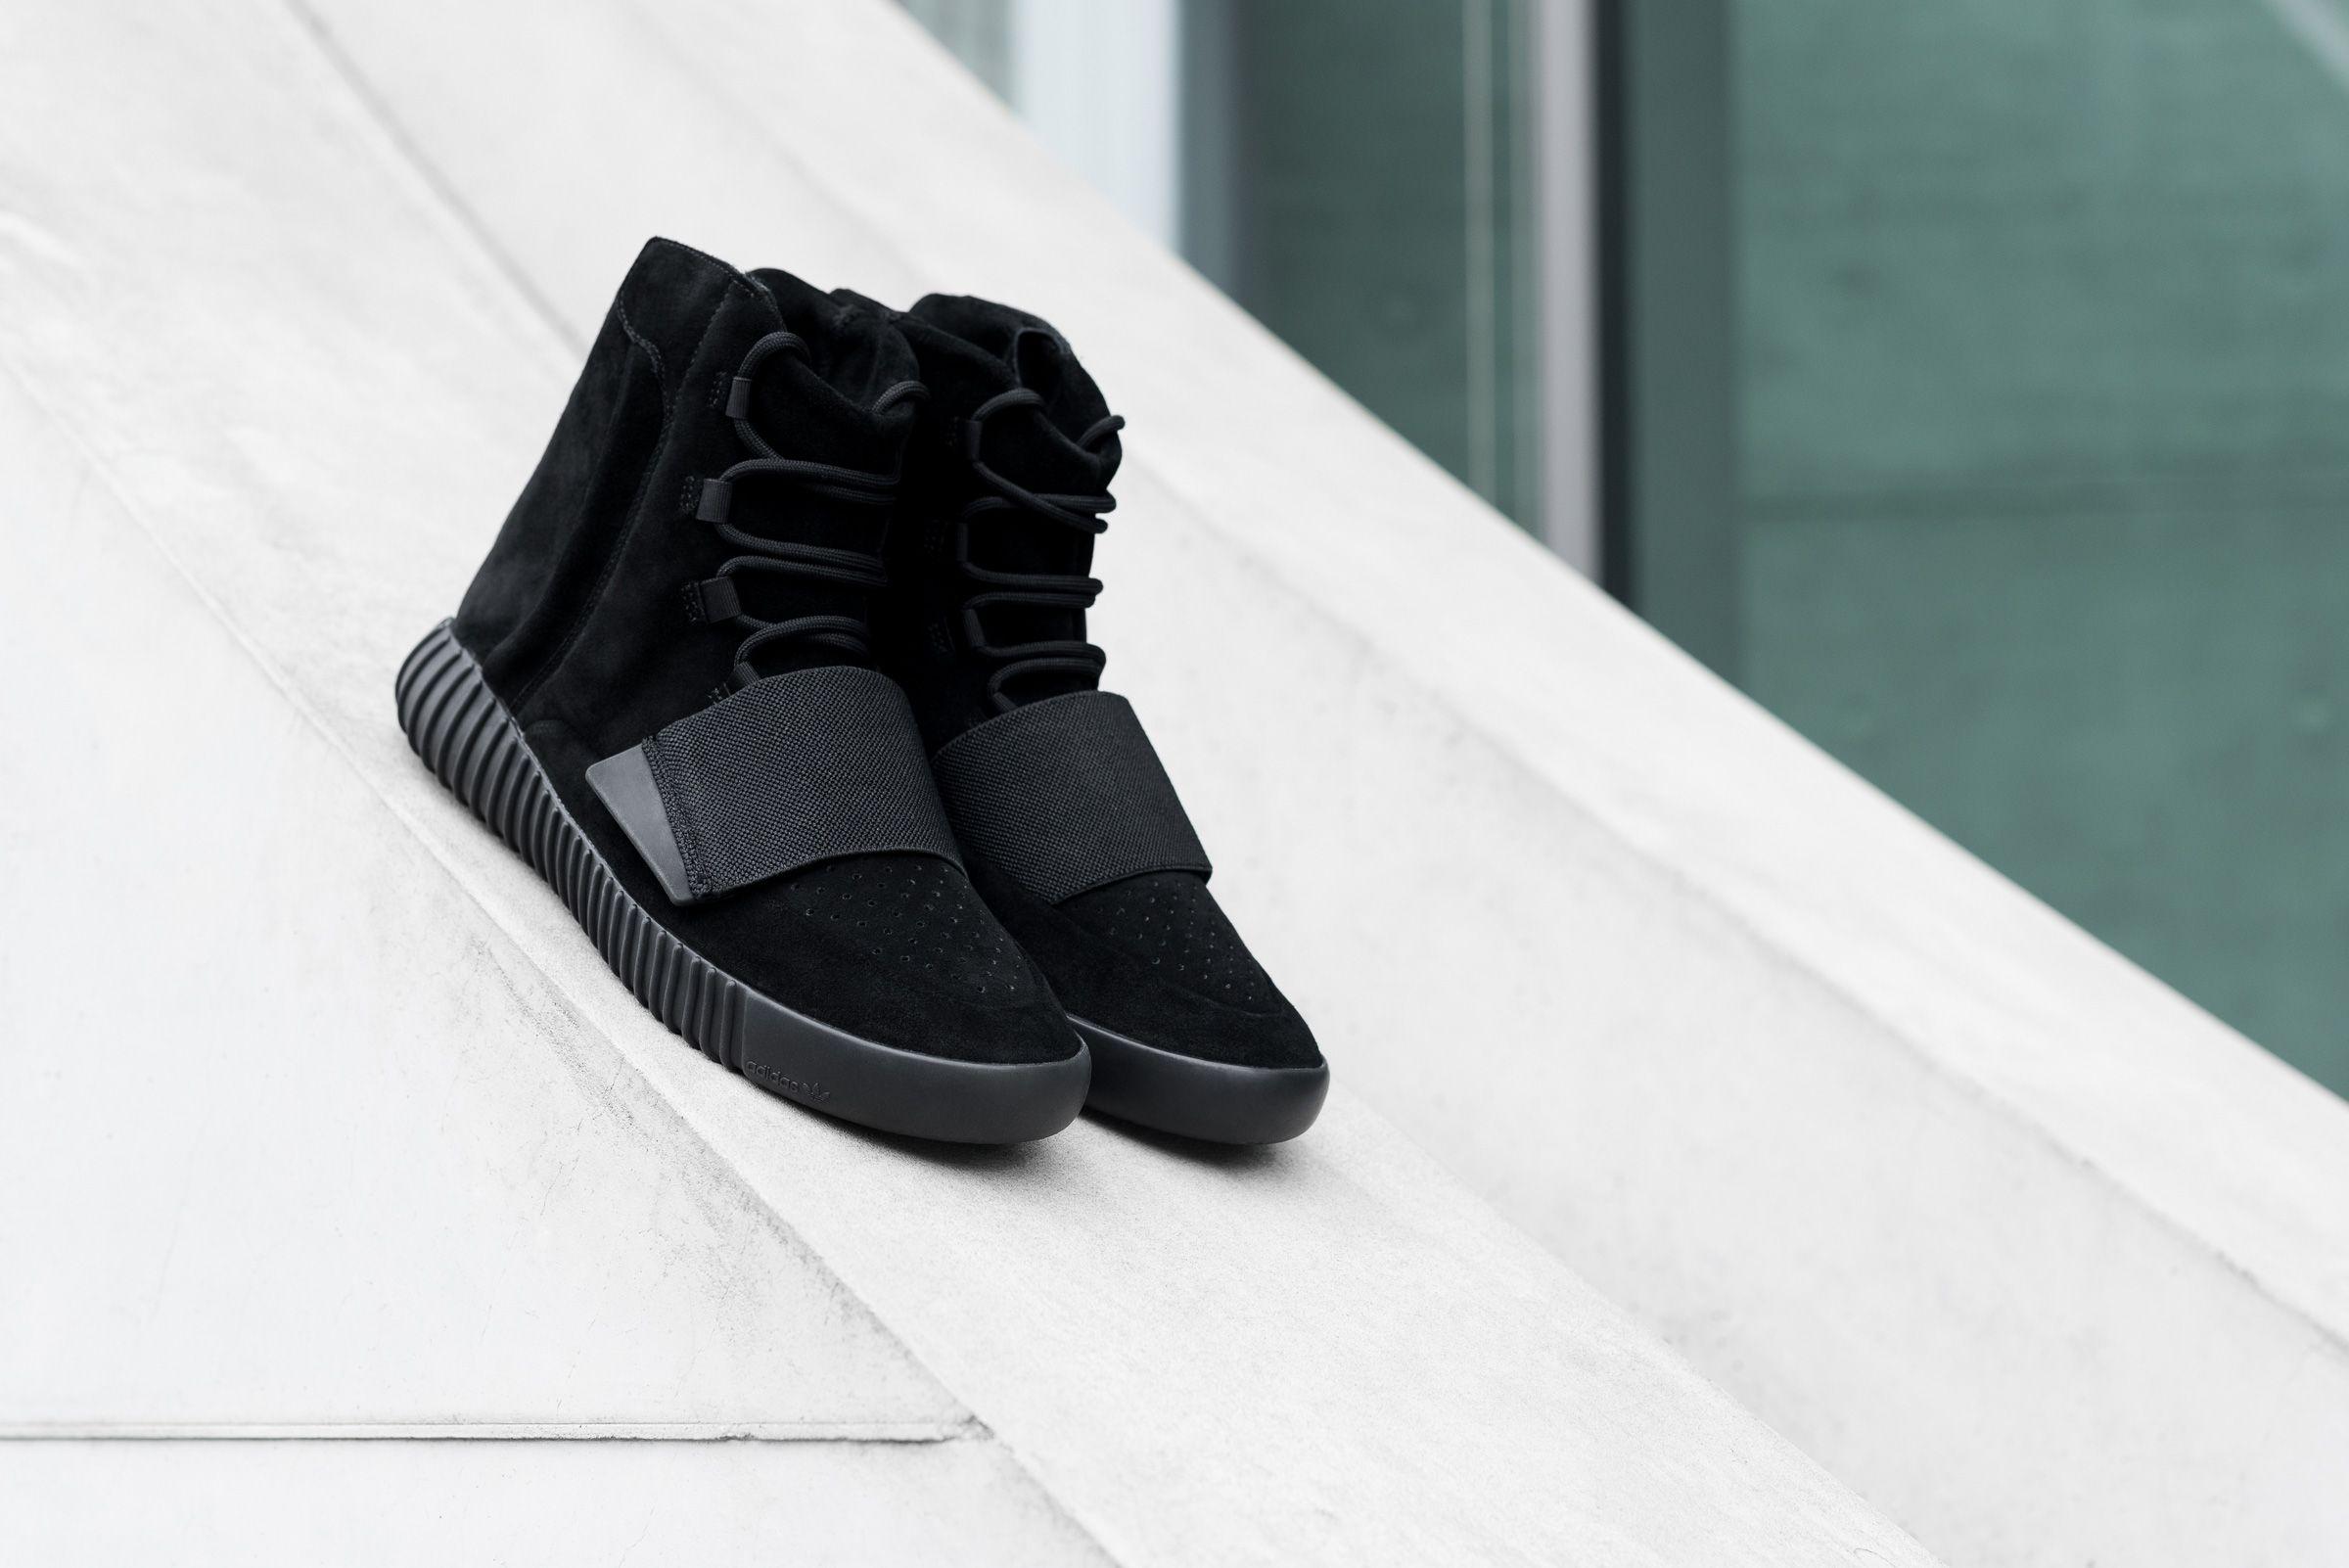 149c6aff4637d7 bb1839-adidas-yeezy-750-boost-black-release-infos-6